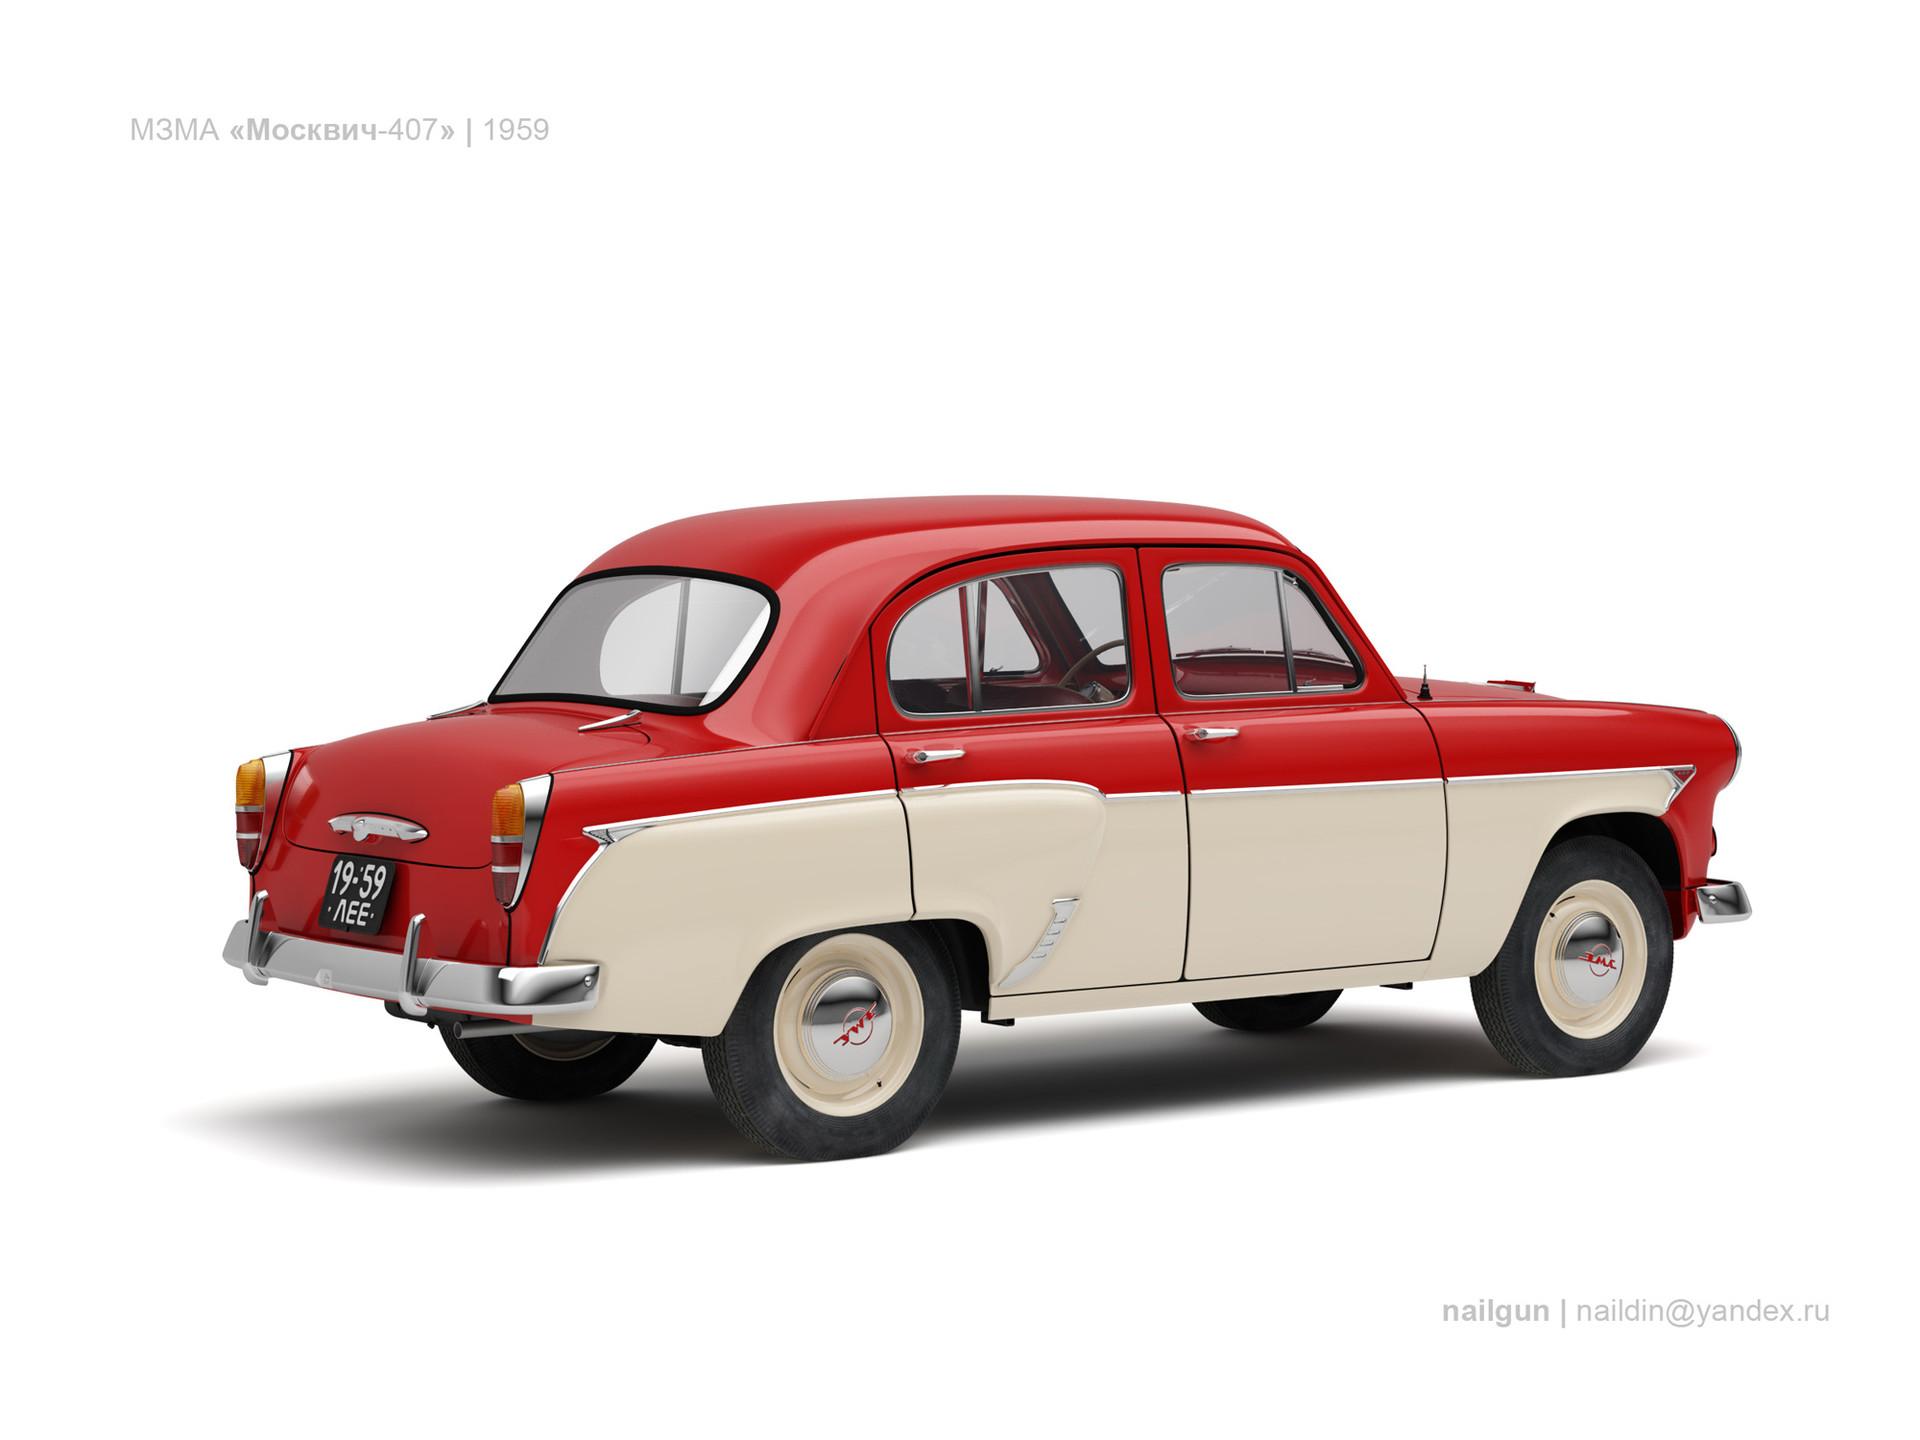 Nail khusnutdinov ussr moskvich 407 1959 1